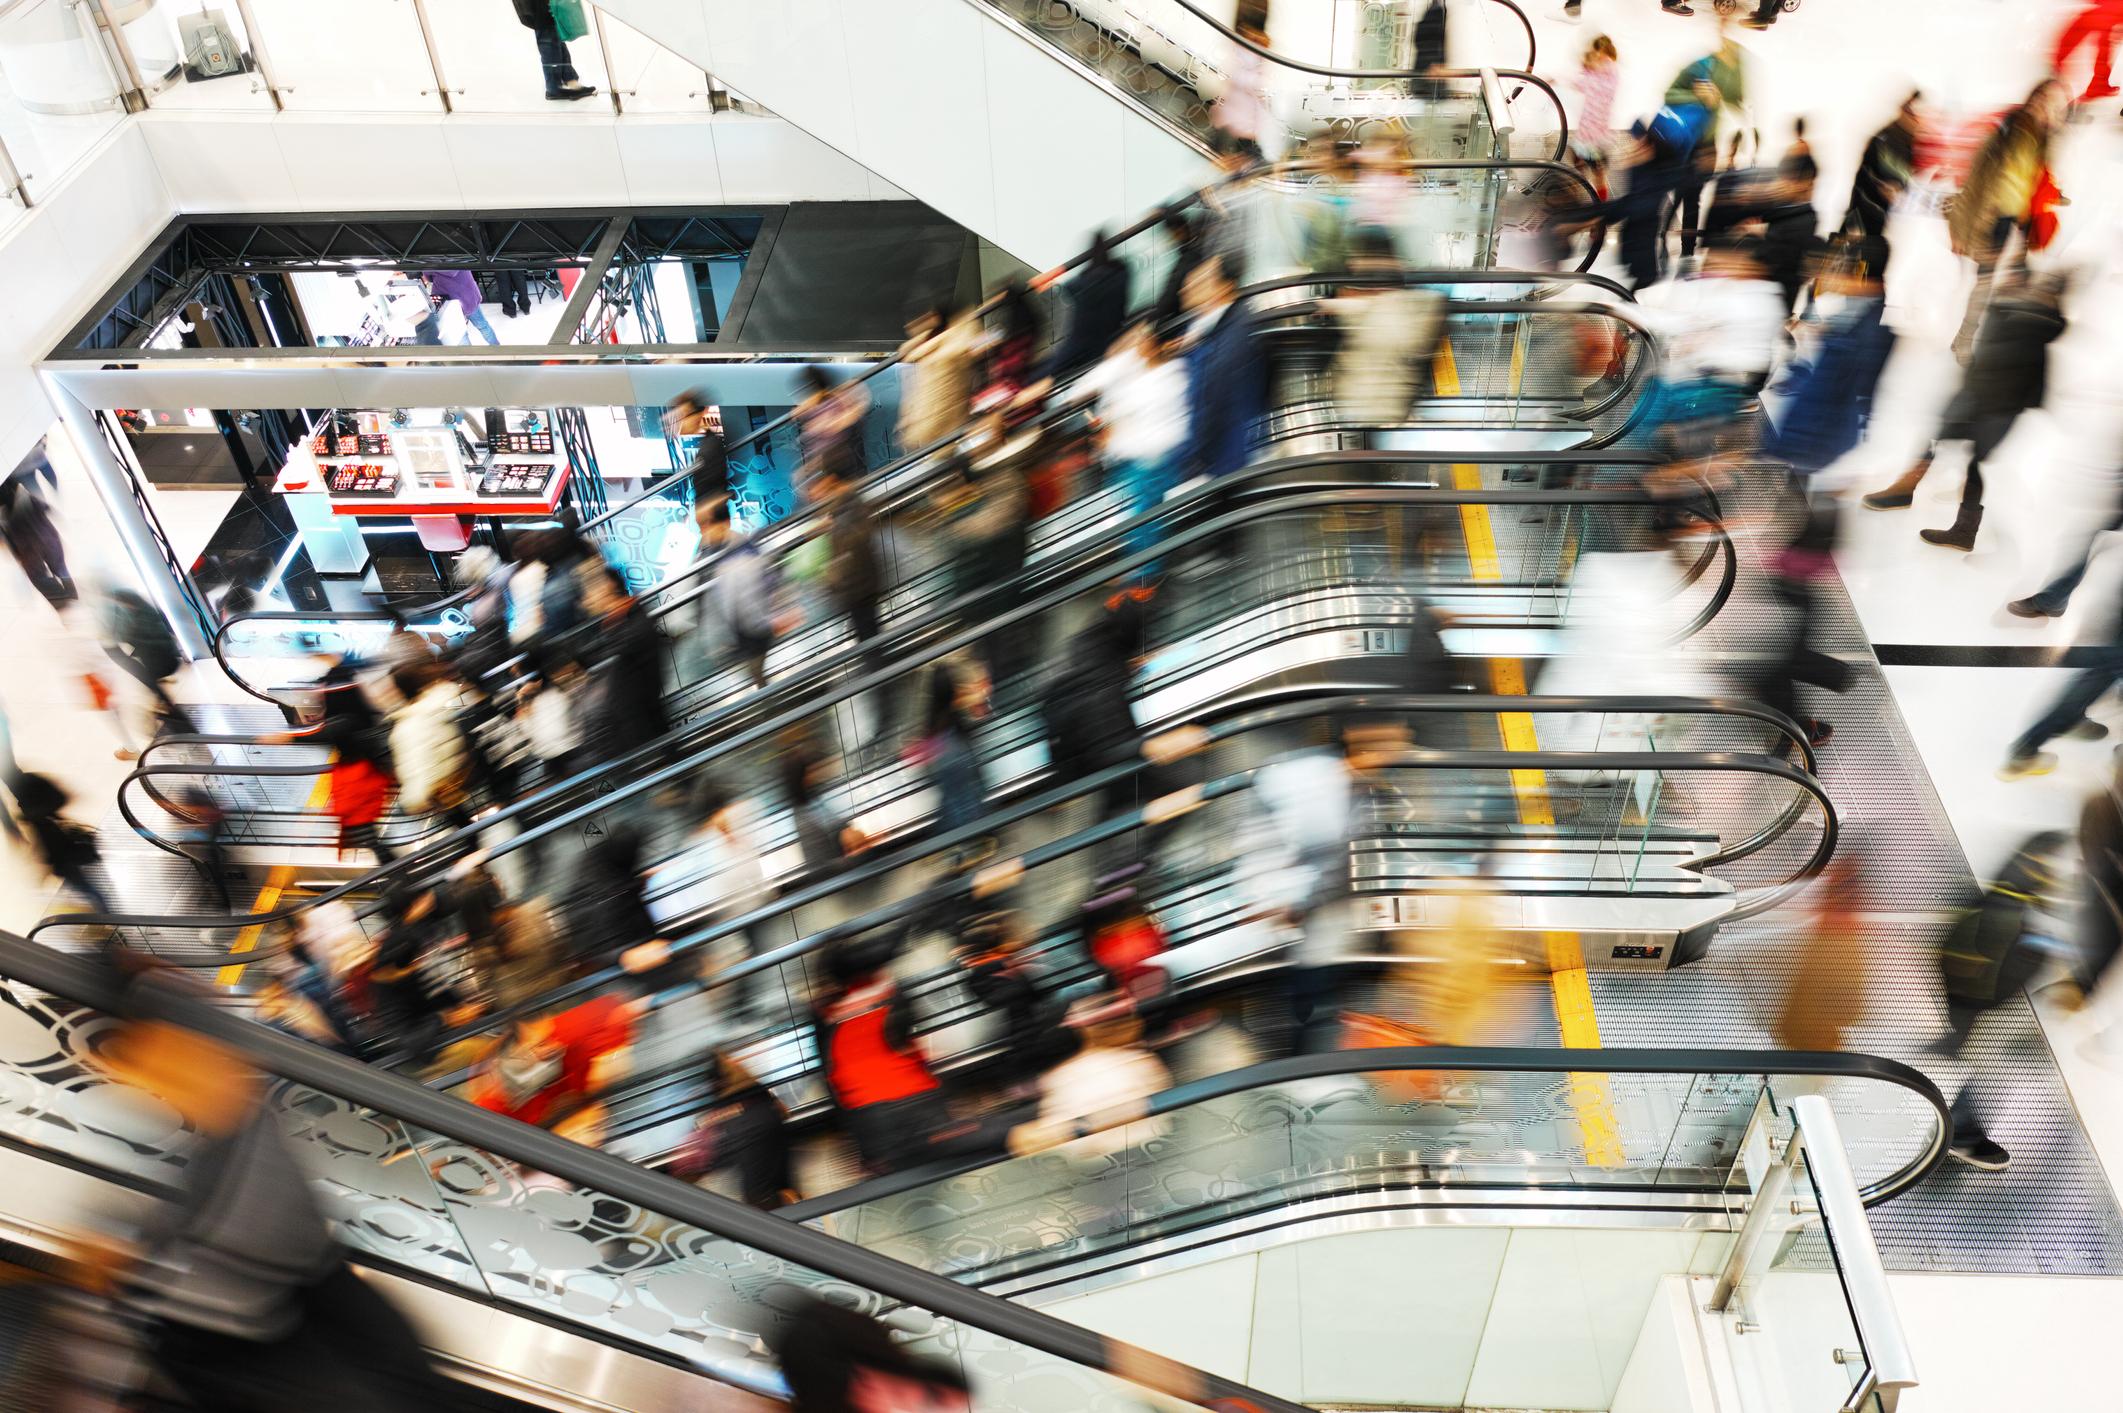 Multiple escalators inside a busy shopping mall.